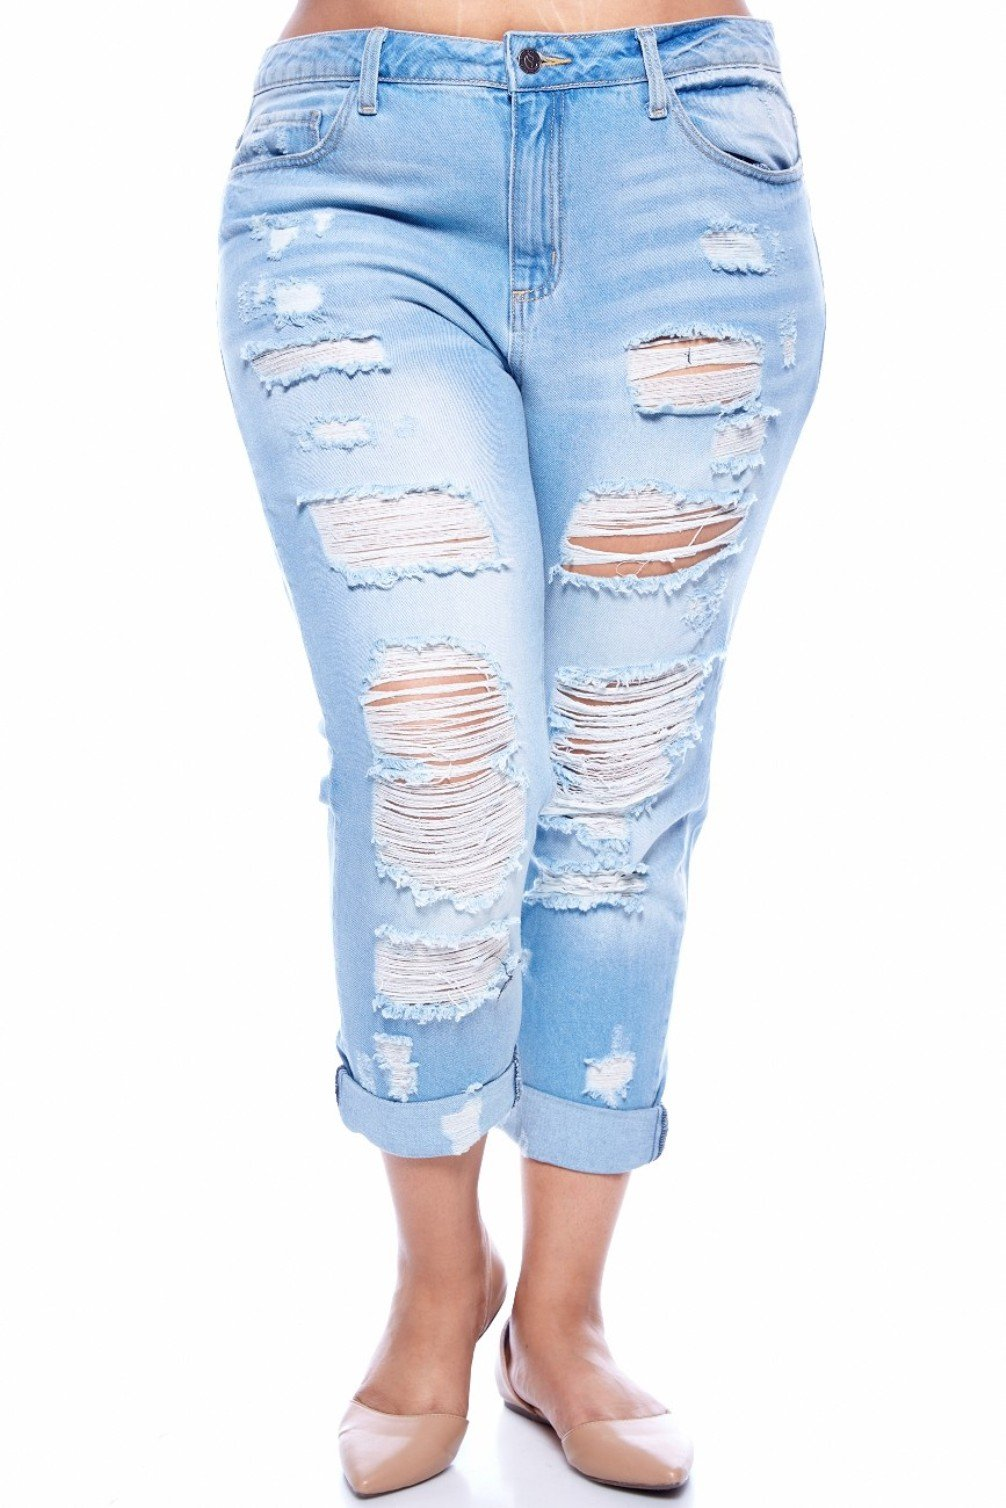 CELLO WOMENS PLUS SIZE BLUE Boyfriend Denim Jeans Ripped Distressed pants 1826 (16)